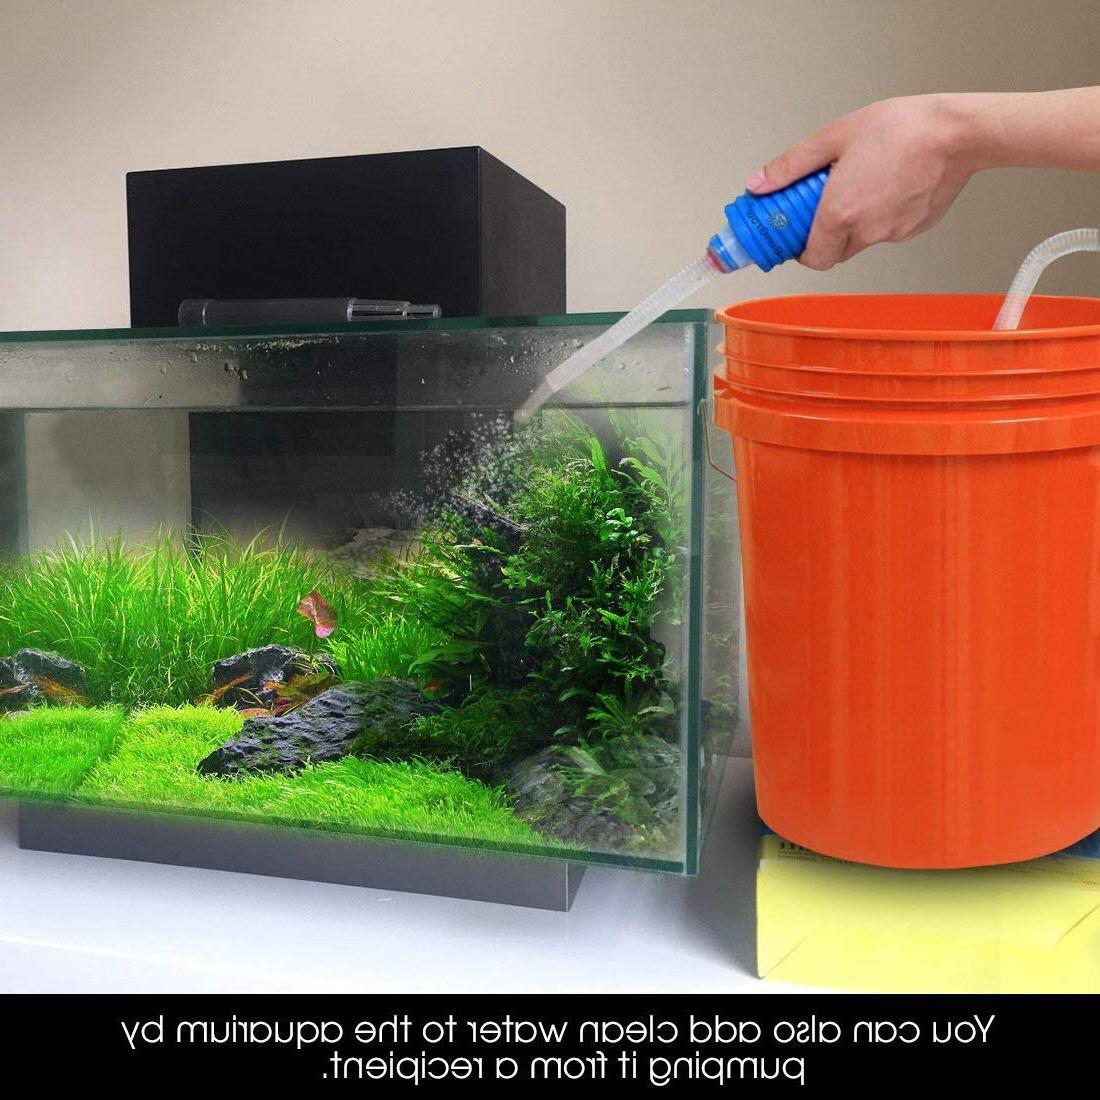 <font><b>Aquarium</b></font> Fish <font><b>Water</b></font> Change Suction Pipe Filter Fish <font><b>Water</b></font> Change Pump Filters